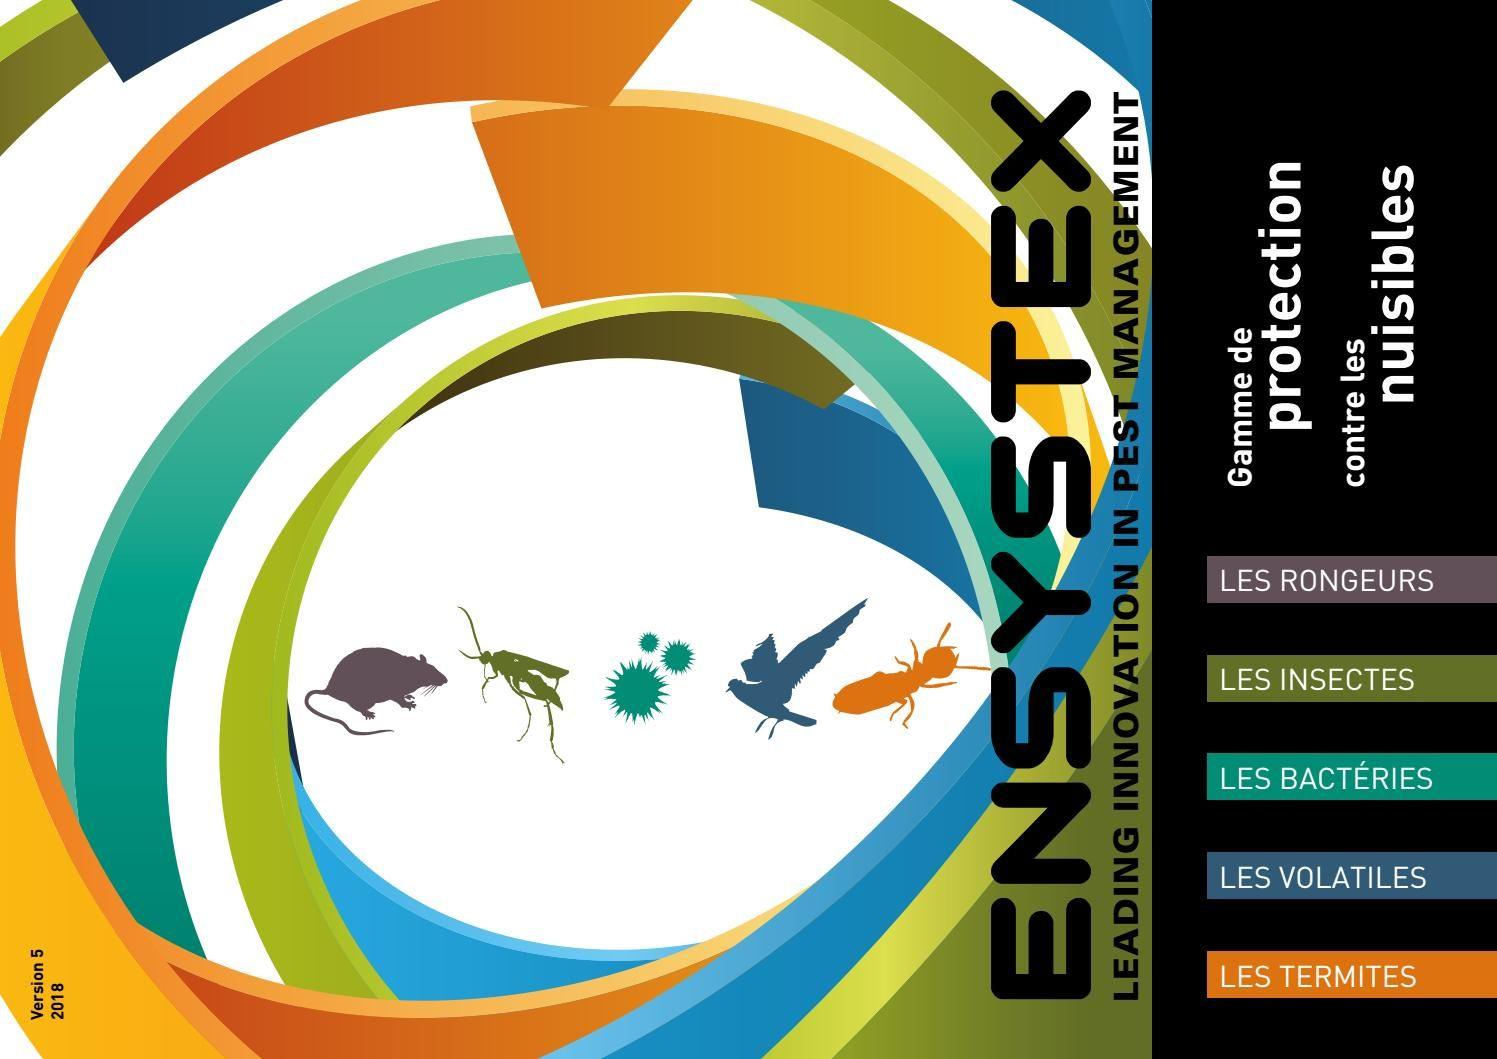 Temps Apparition Piqure Punaise De Lit Charmant Catalogue Ensystex Europe 2018 By Ensystex Europe Issuu